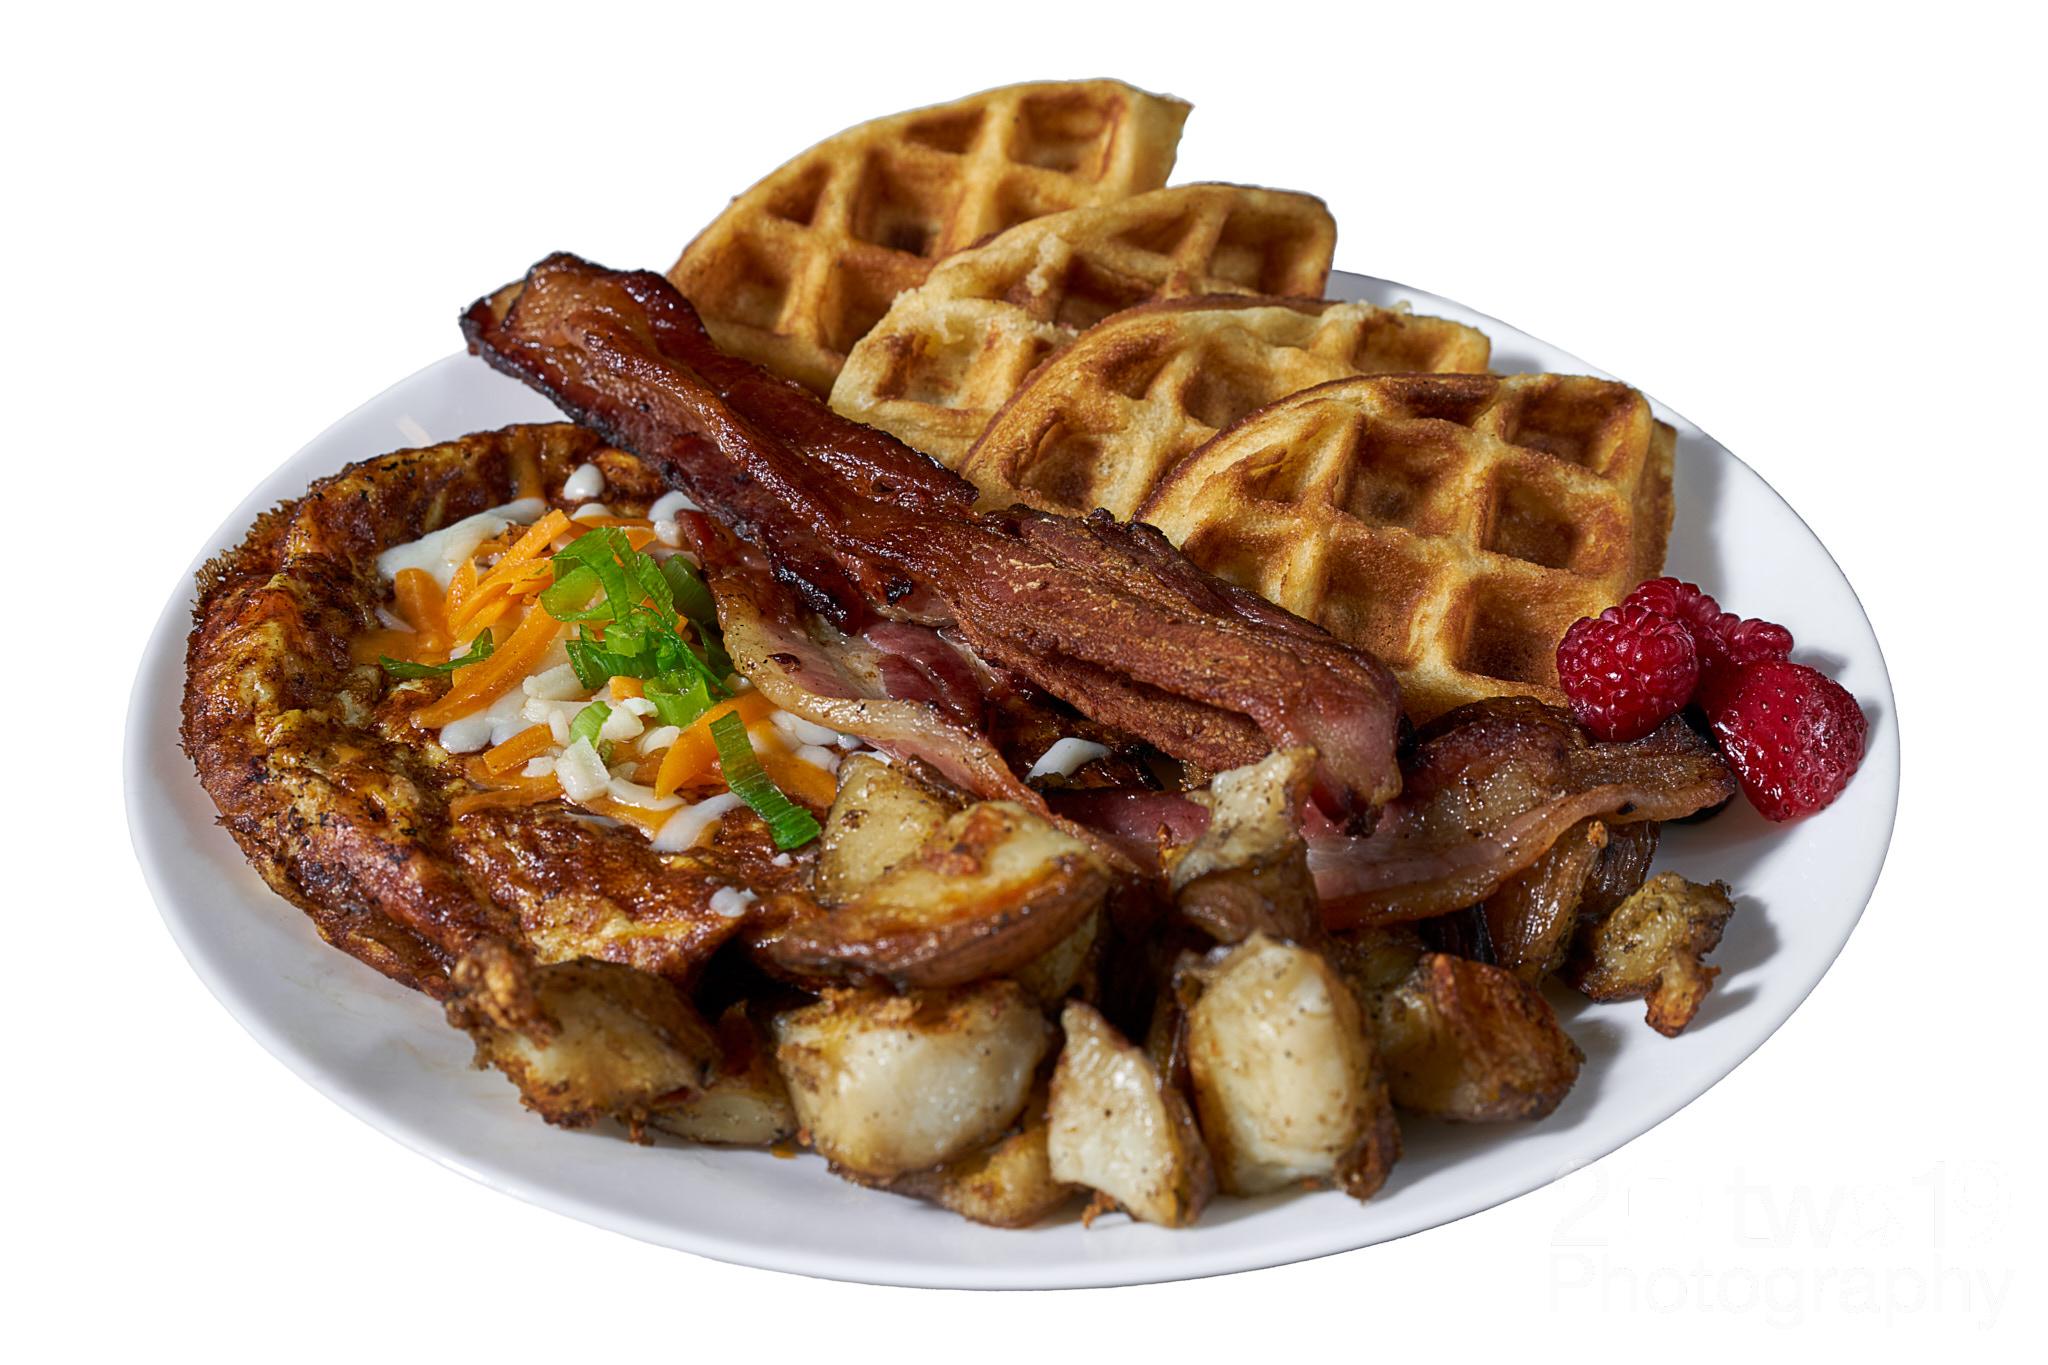 Belgian Waffle and Egg